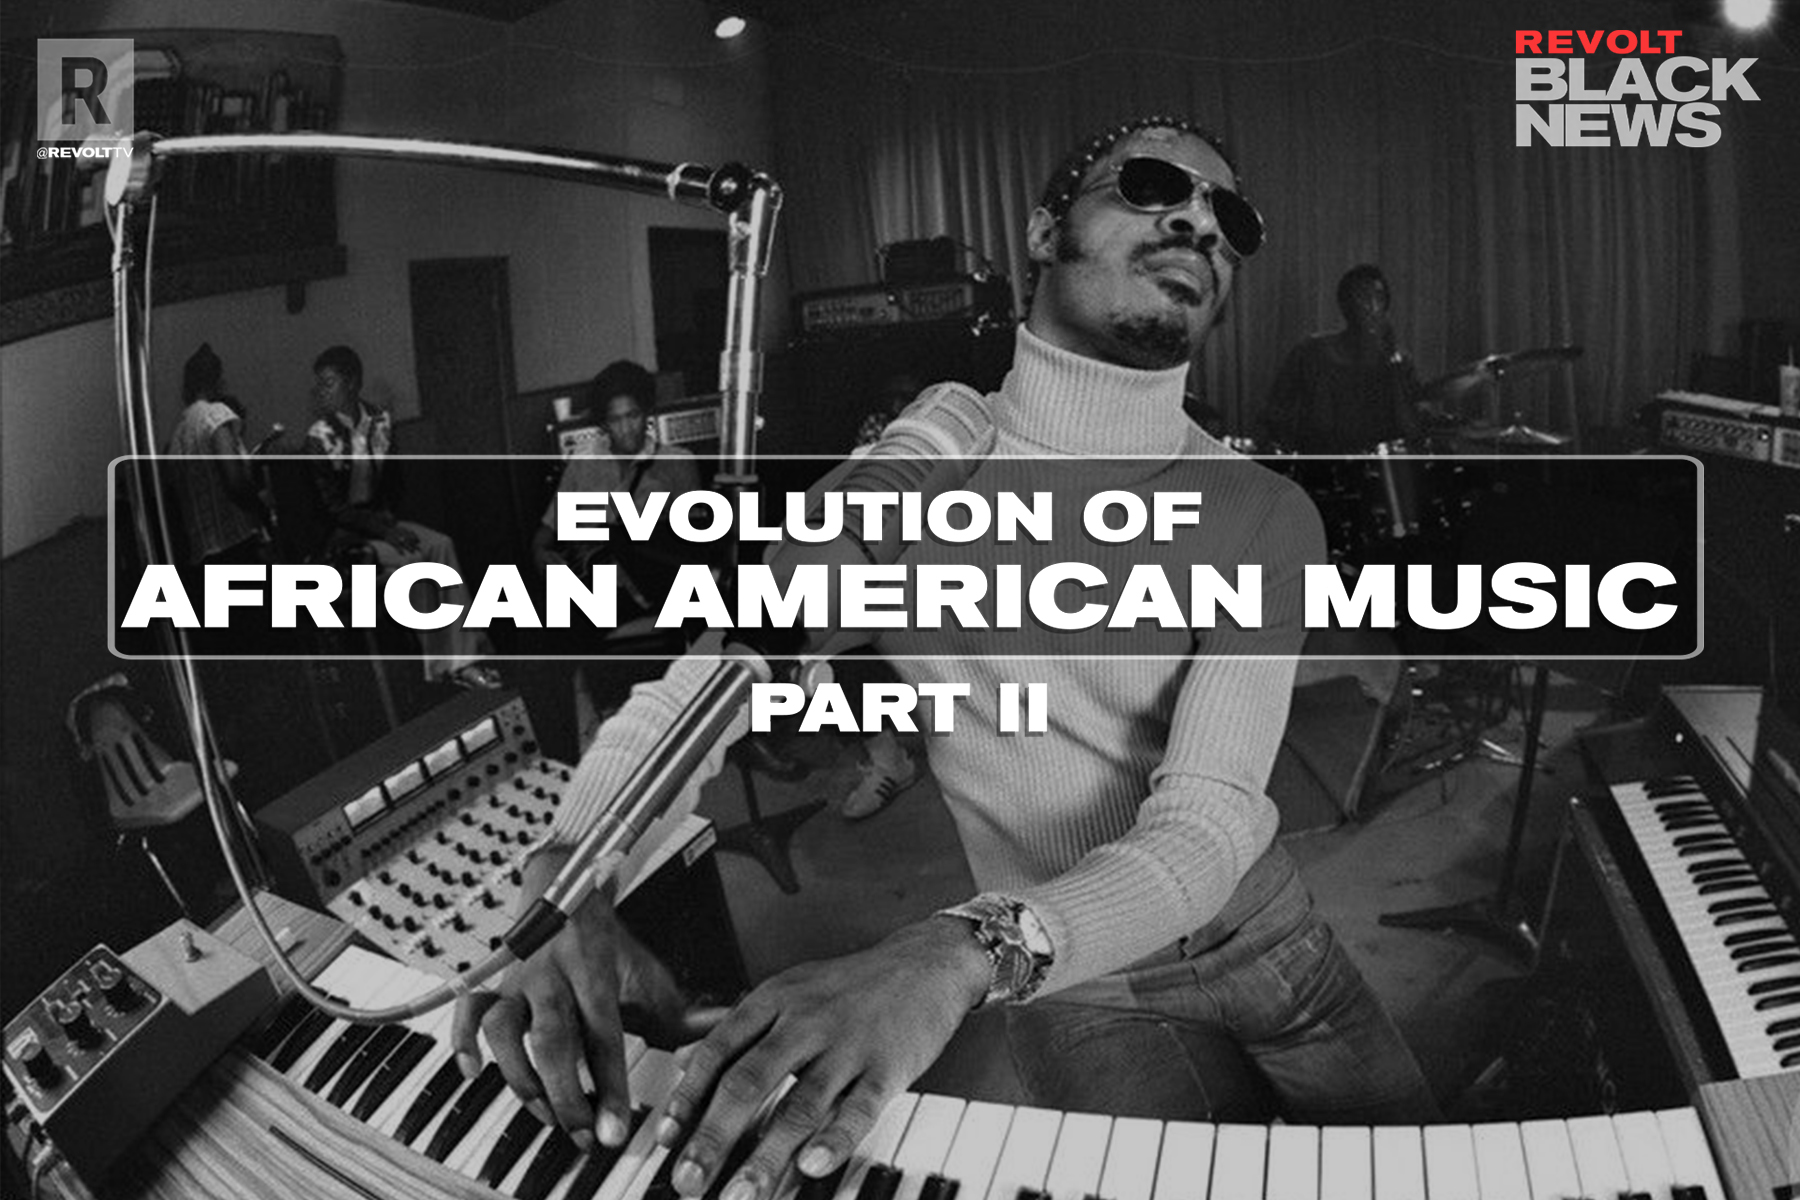 African American music